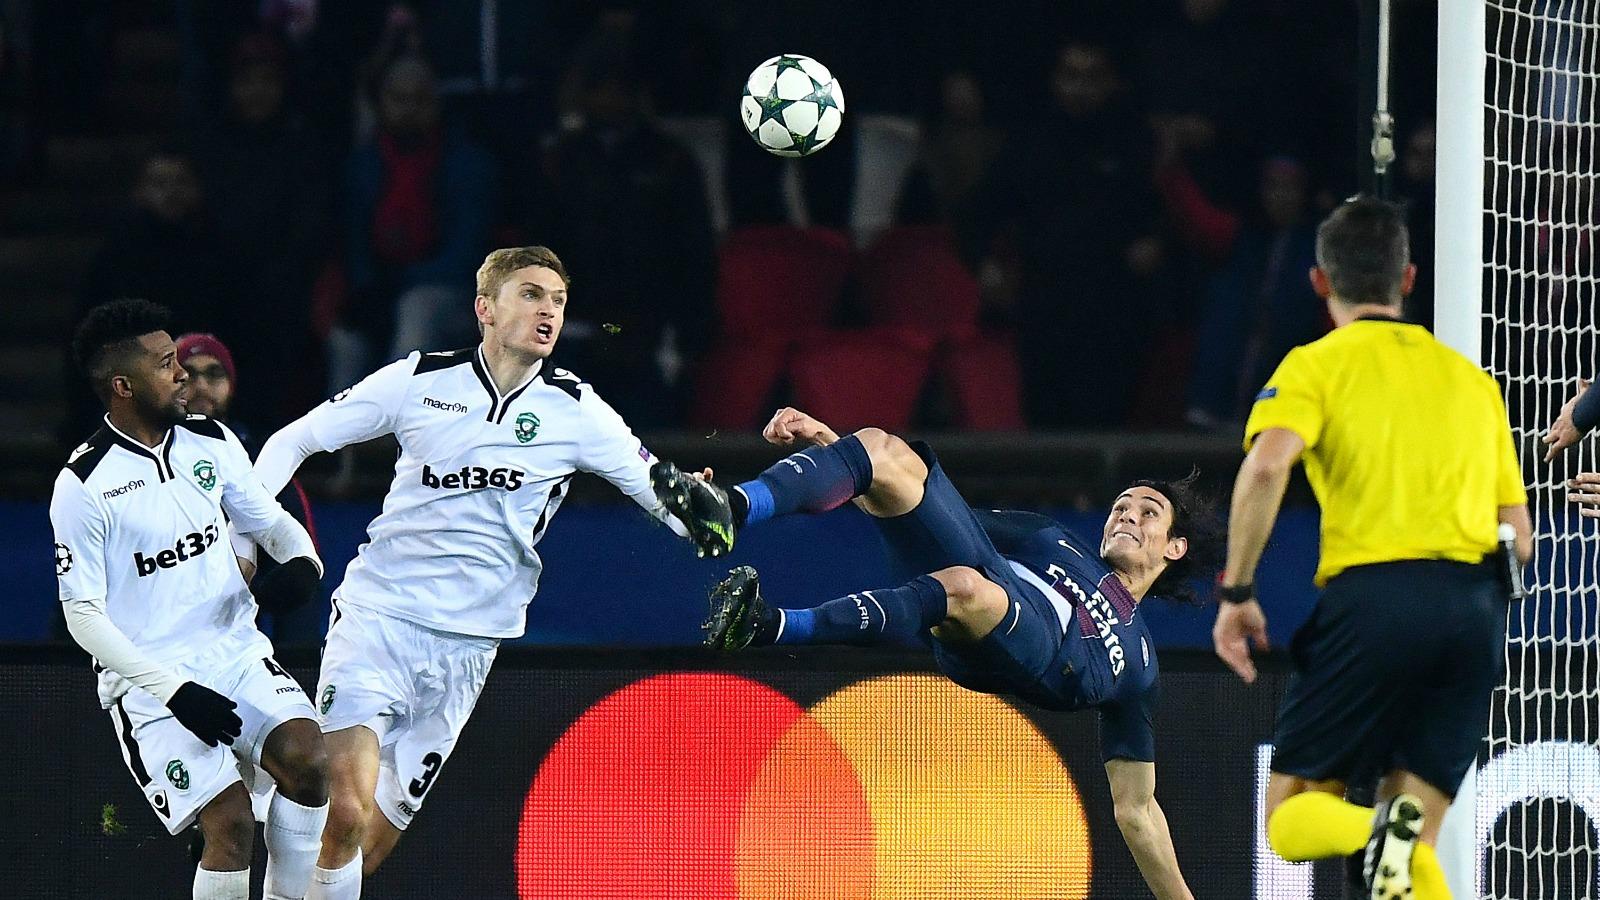 Watch Edinson Cavani's dandy bicycle kick goal against Ludogorets